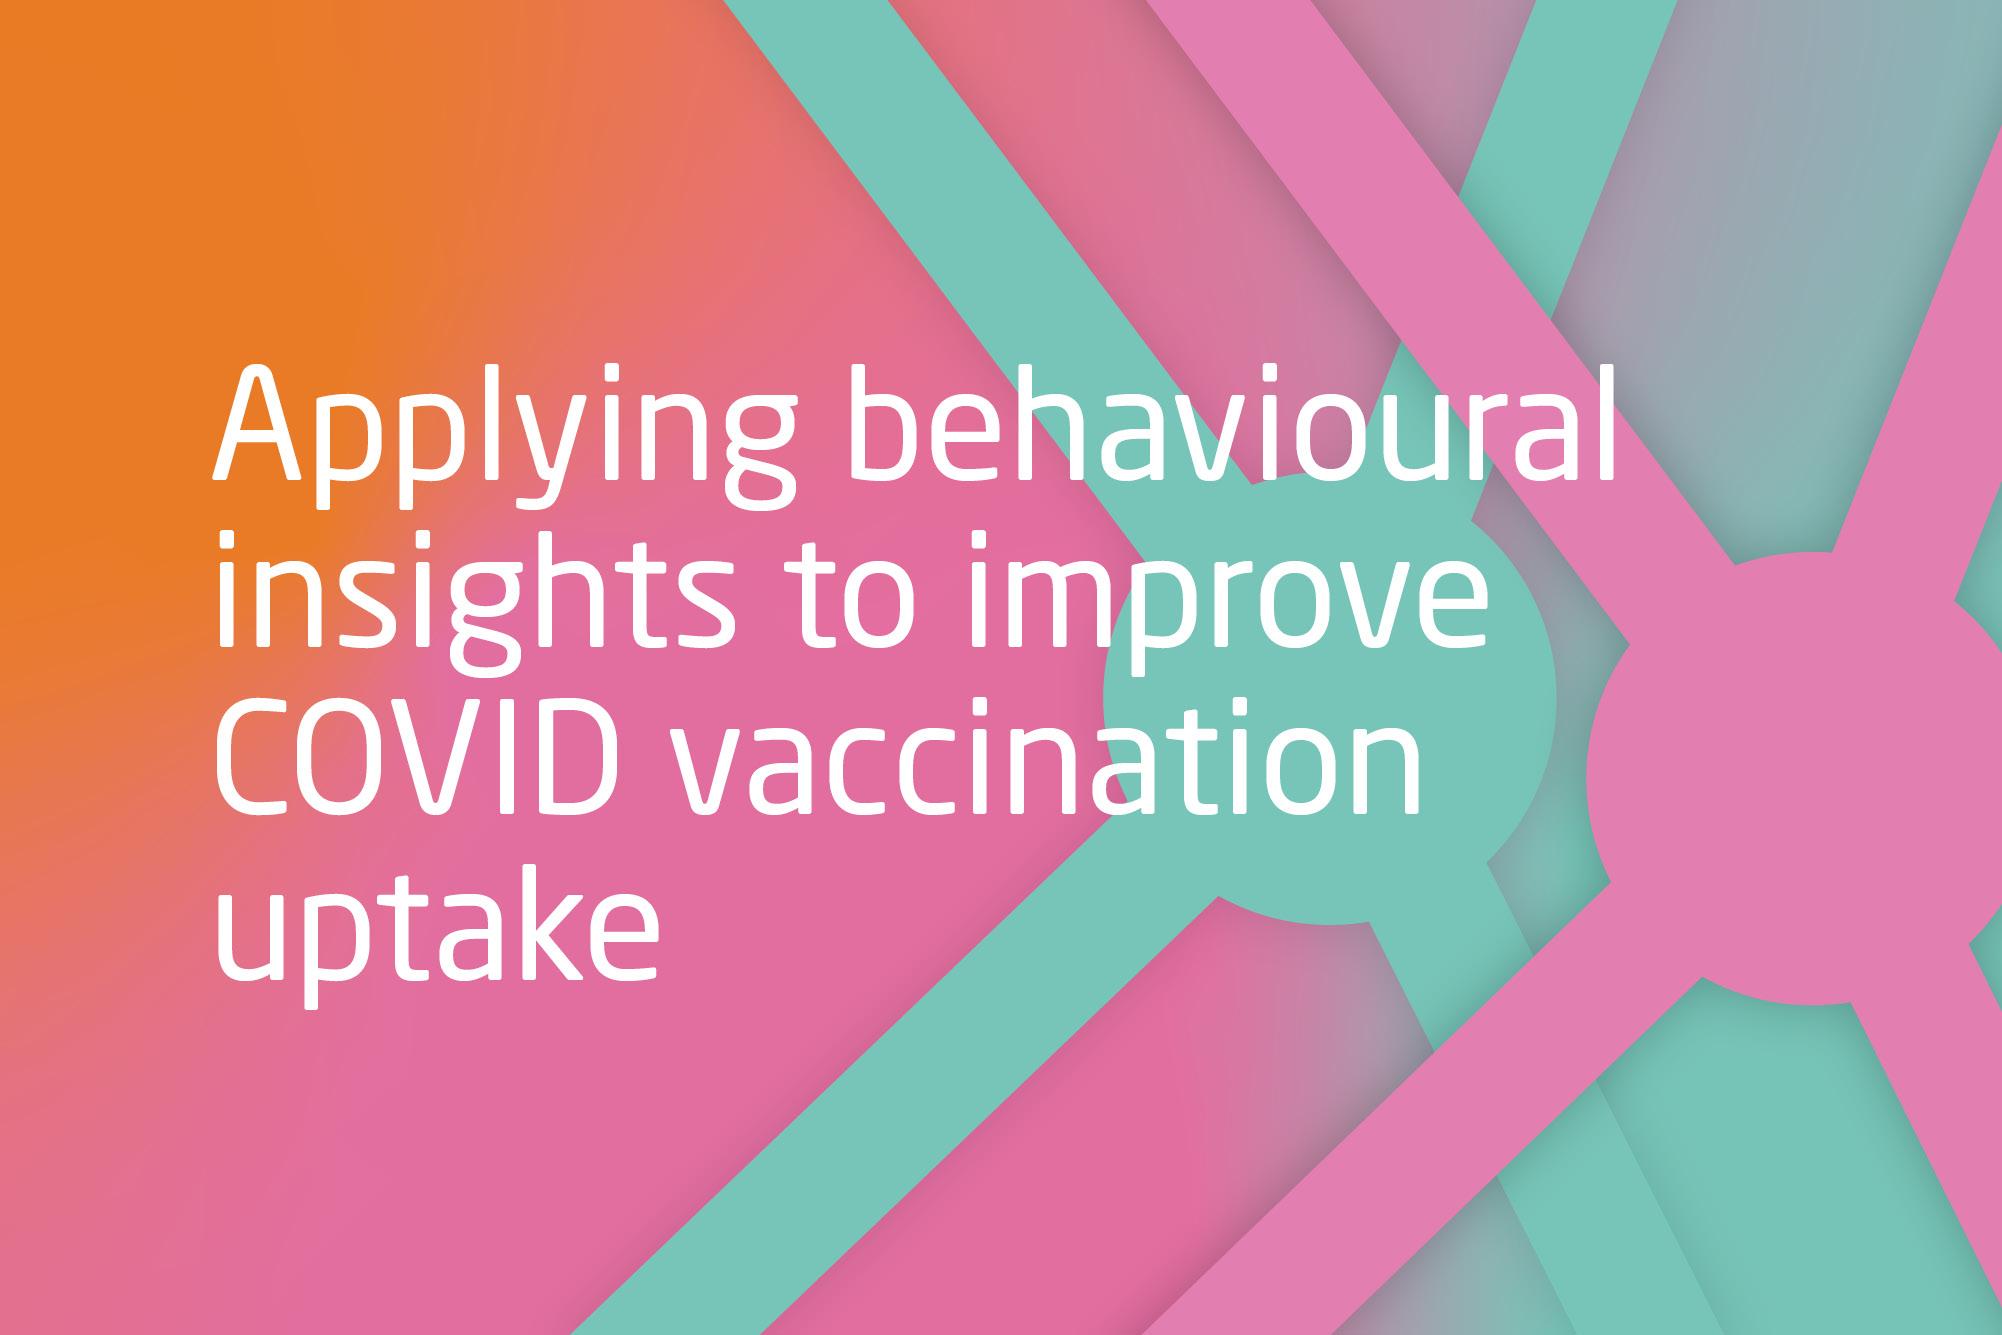 Applying BI insights to improve COVID vaccination uptake